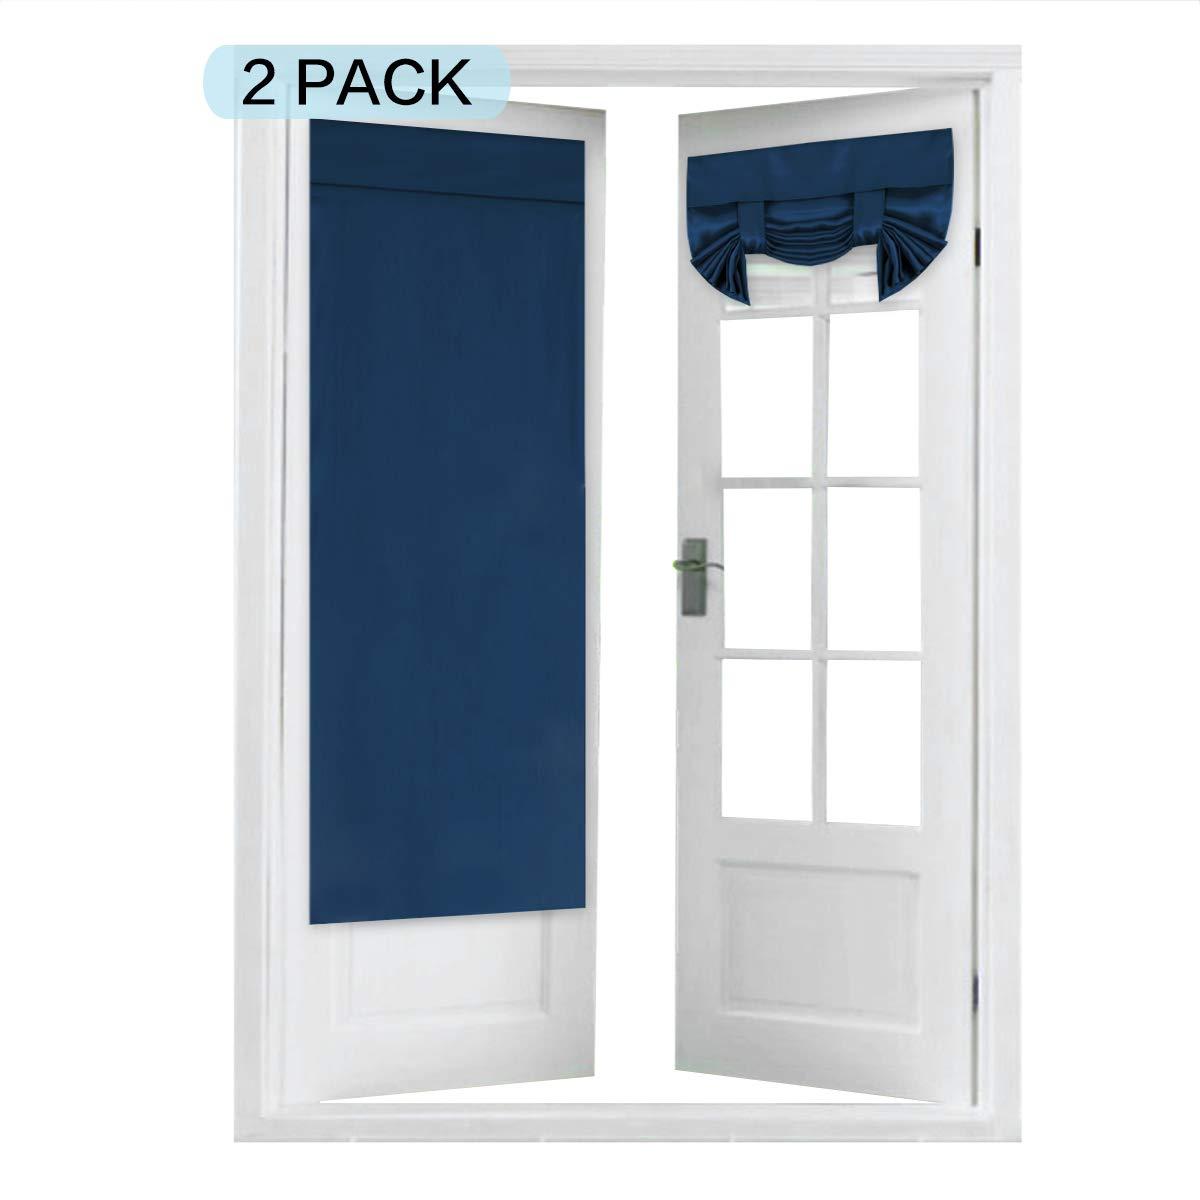 Aqua Blackout Curtain Rod Pocket 2 Panels FlamingoP Tricia Window Door Curtains 26 x 68 Inches